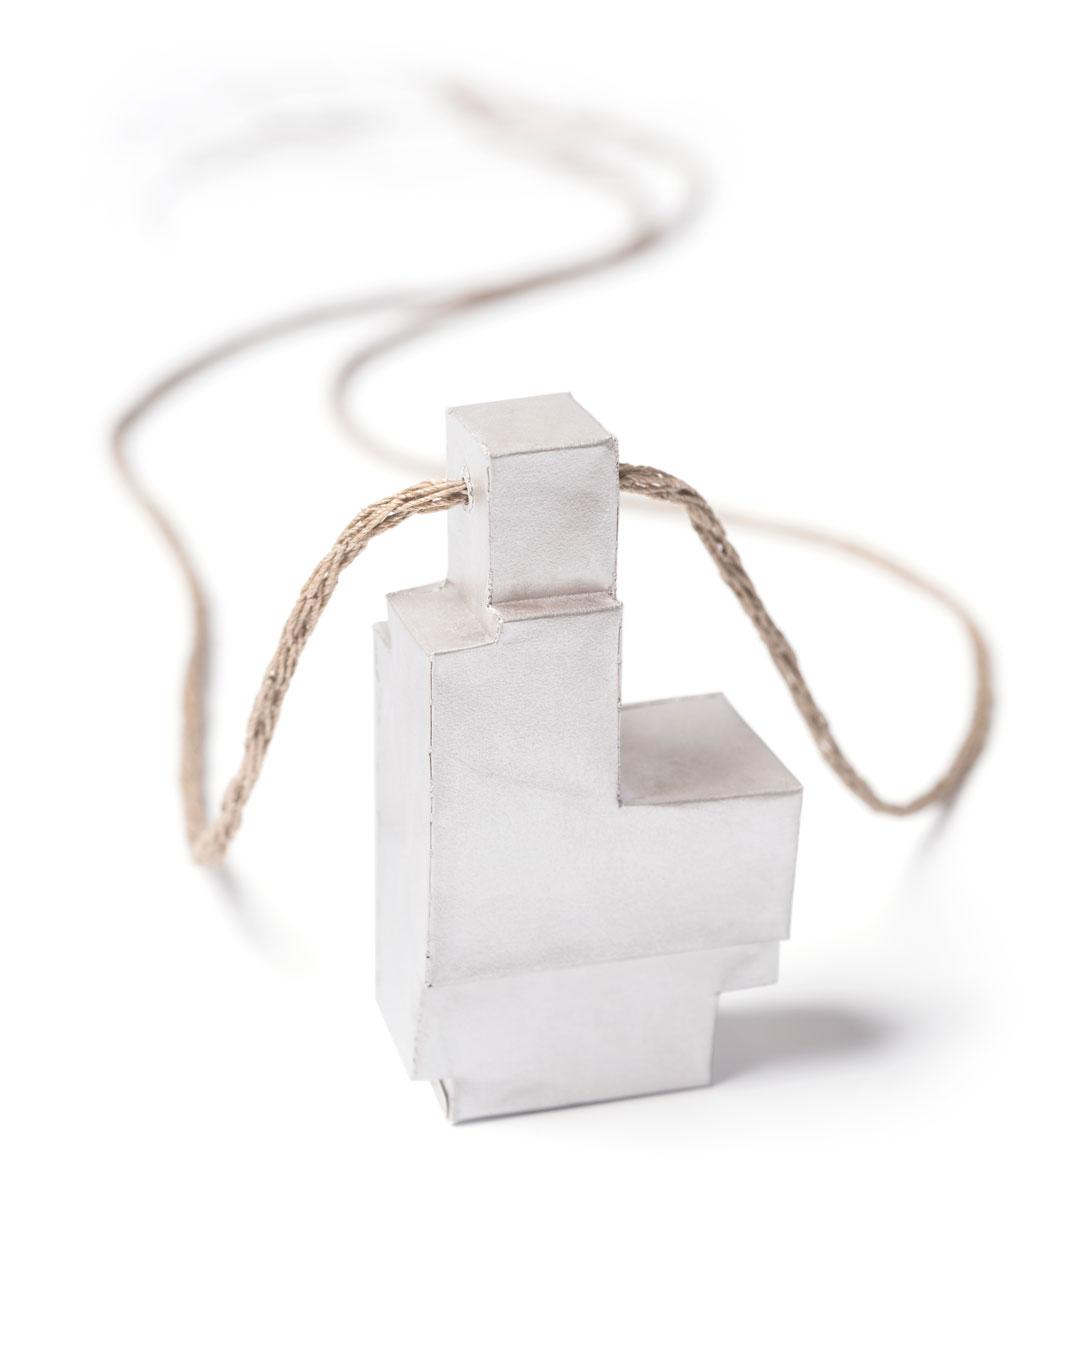 Carla Nuis, Unfurl 3, 2018, pendant; fine silver, linen, 57 x 30 x 17 mm, €710